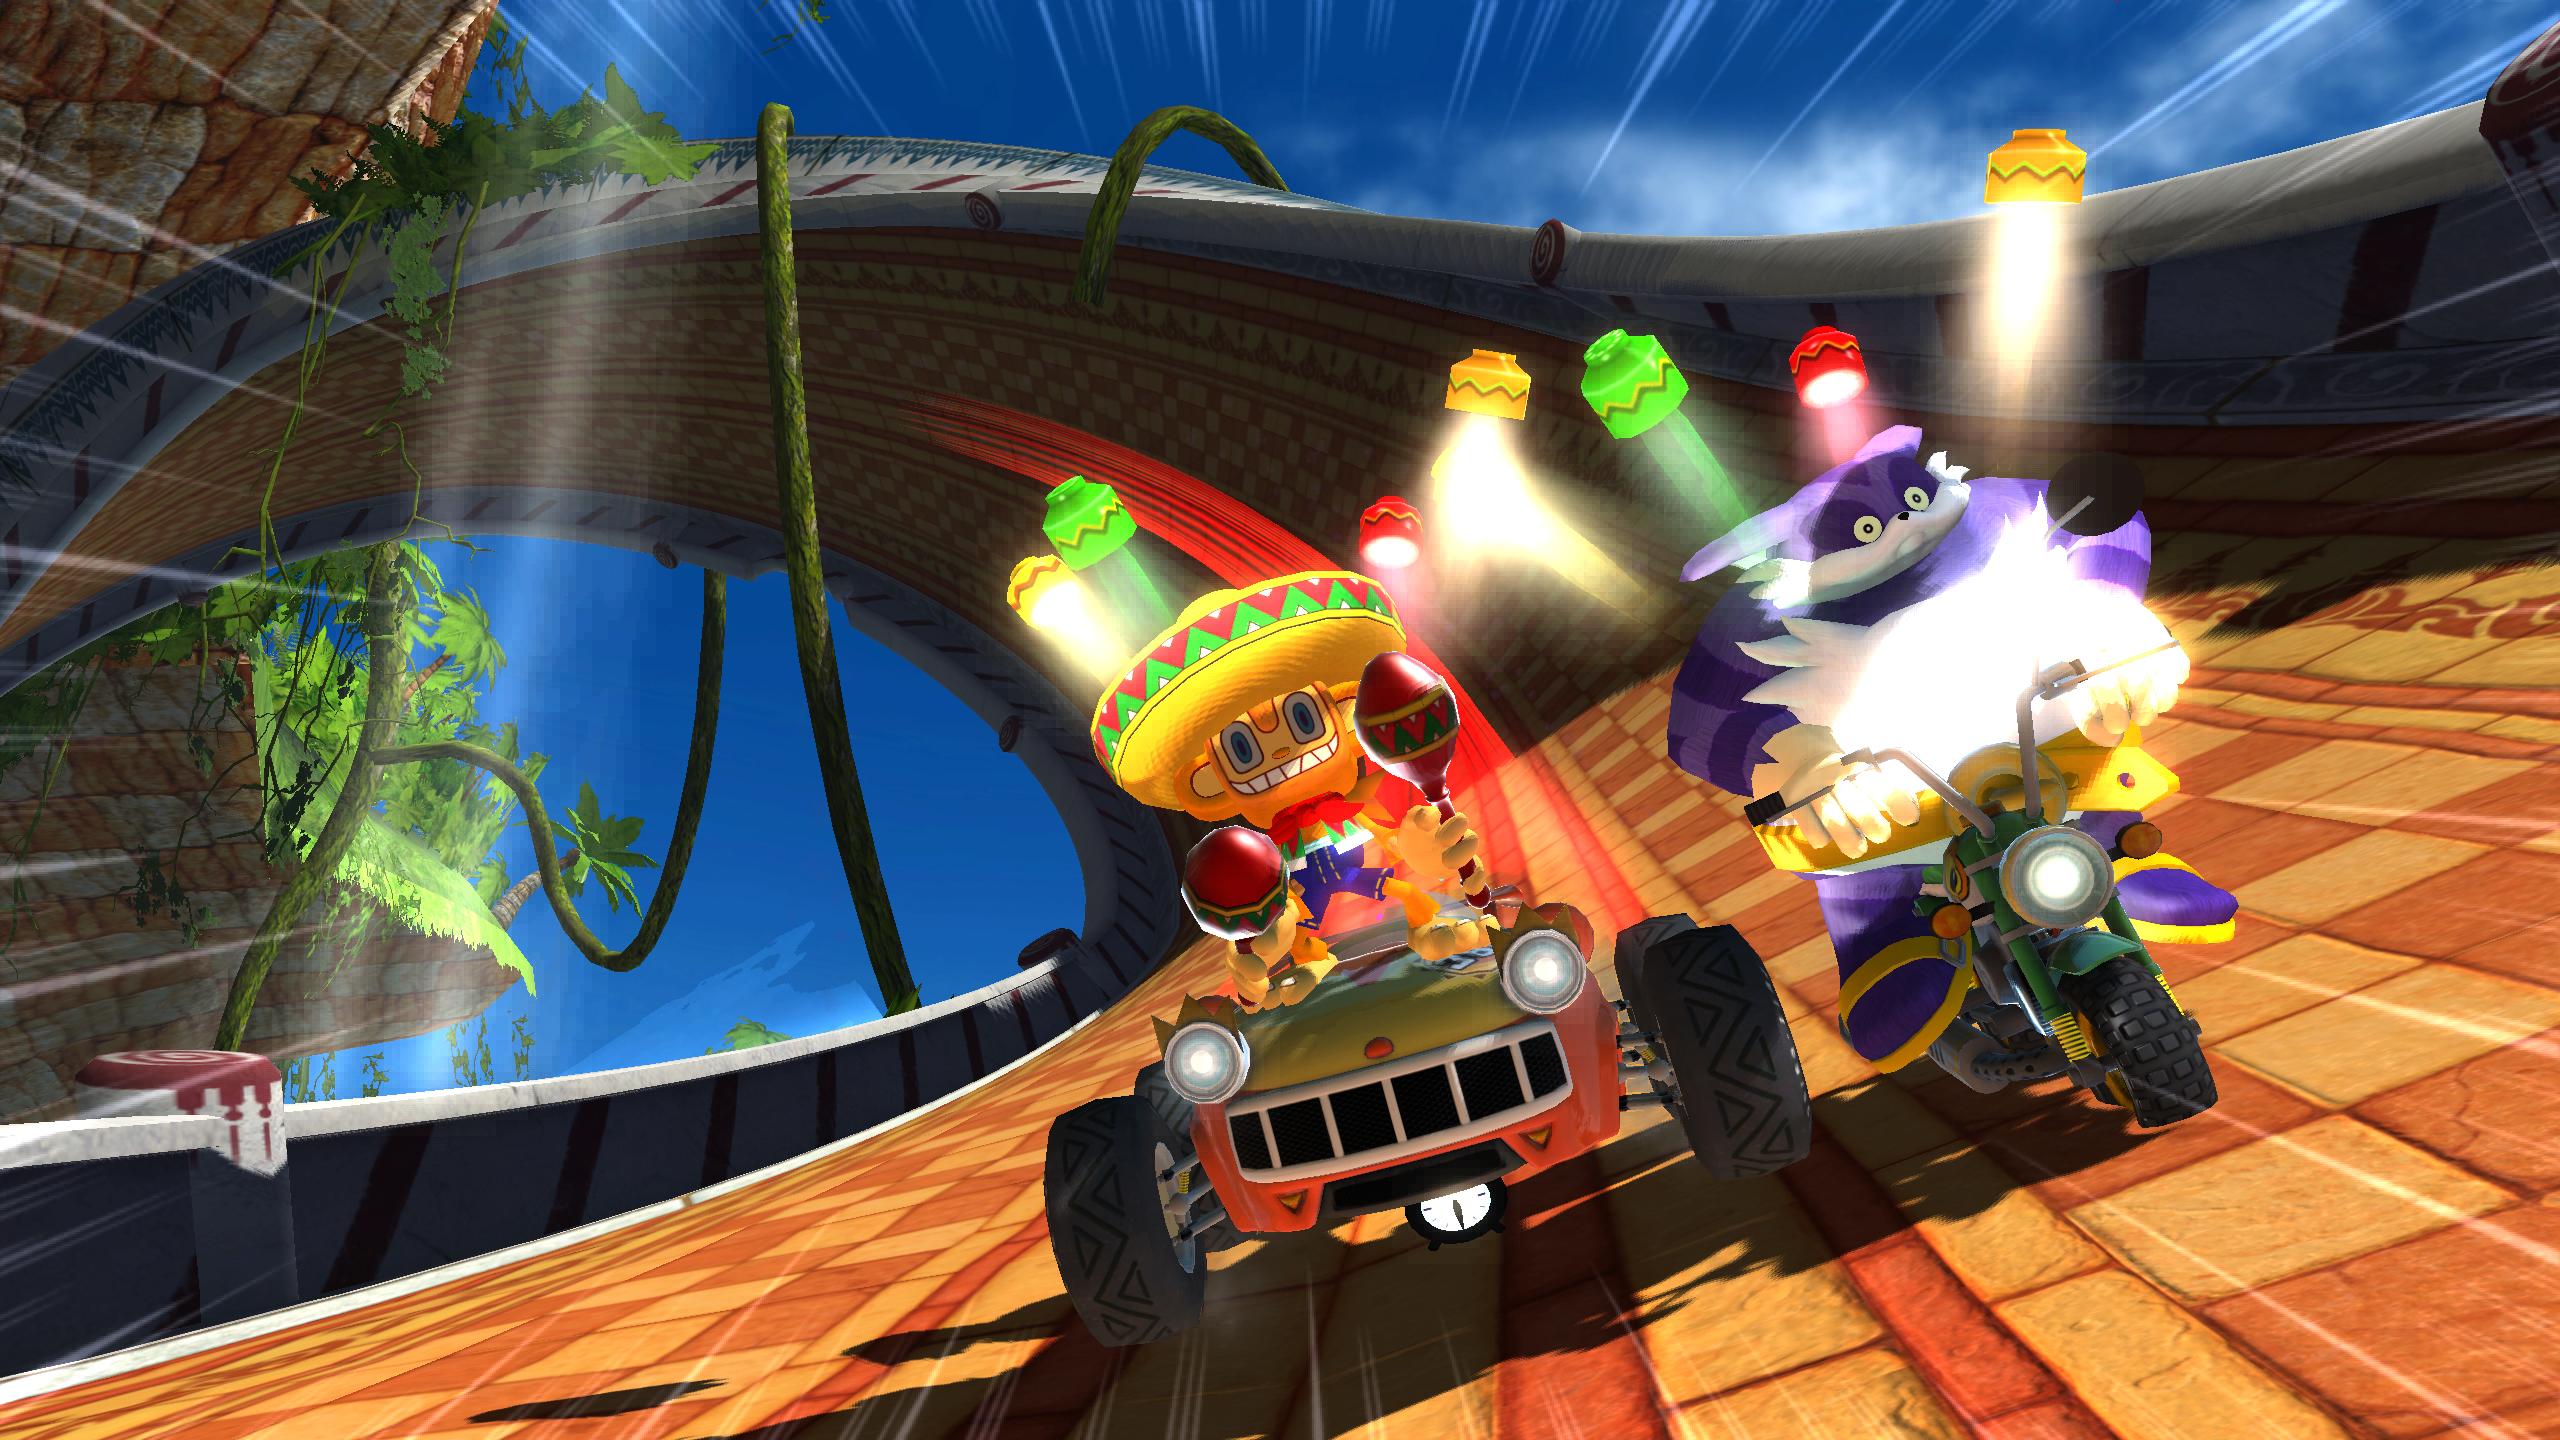 Sonic & Sega All-Stars Finally Available